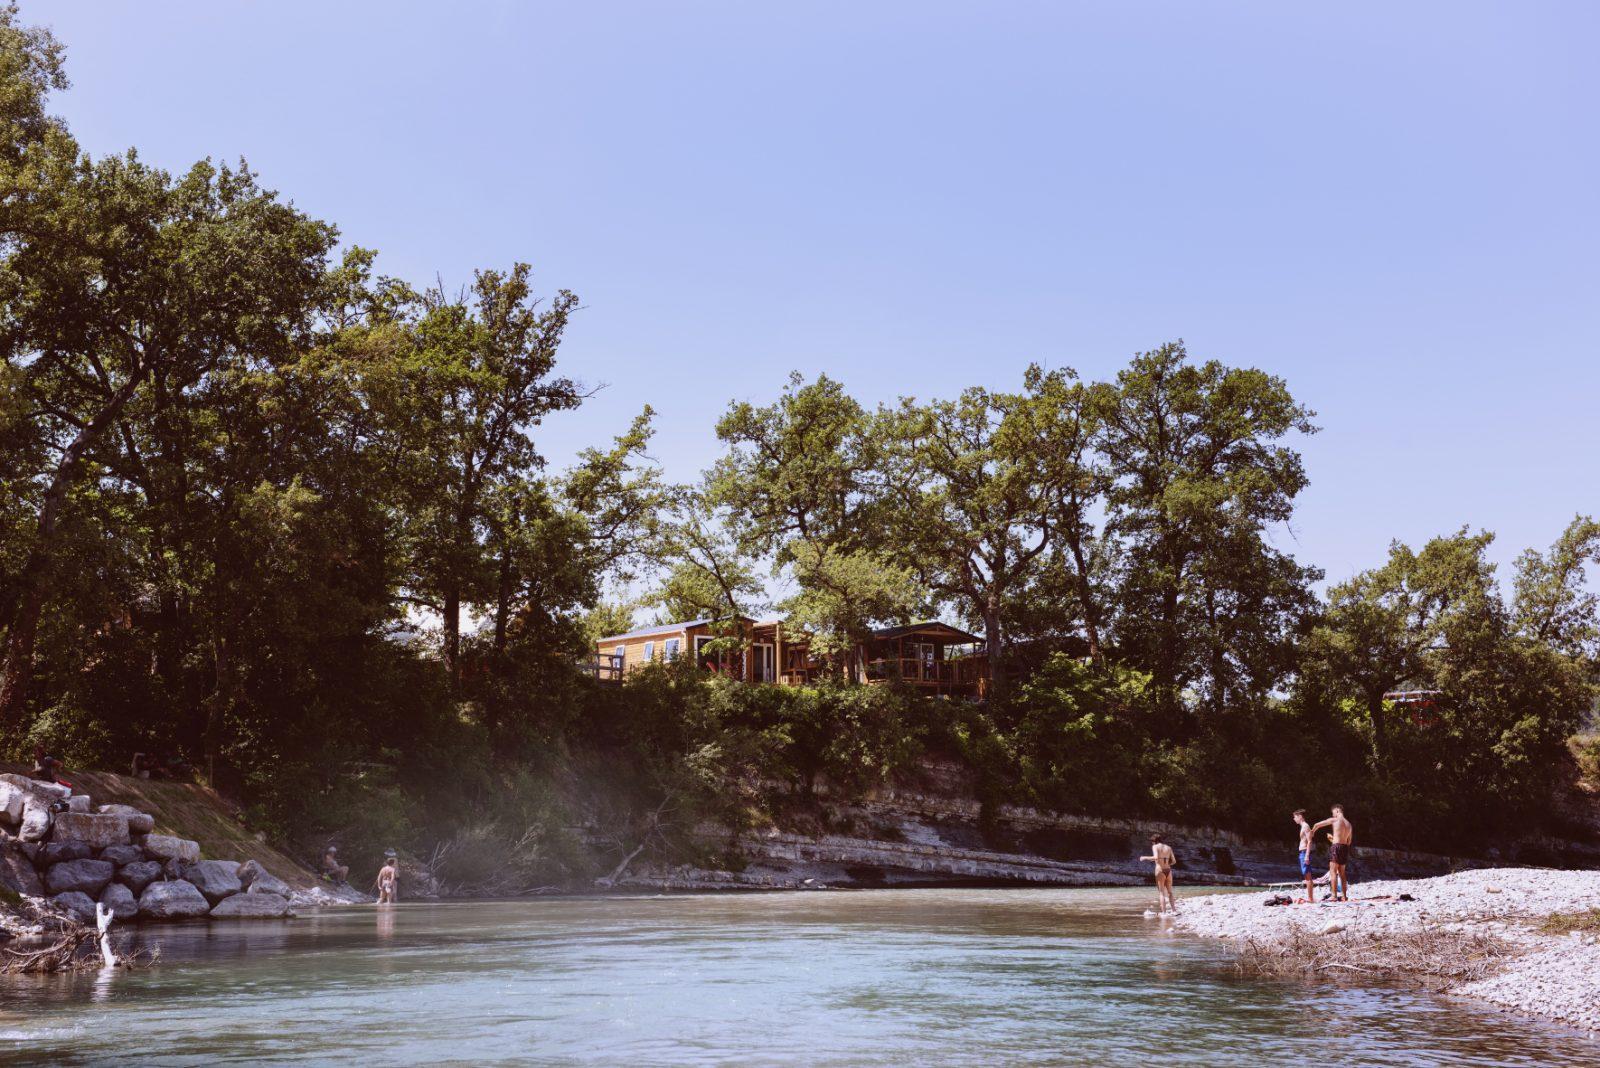 Les Chamberts – Camping et Baignades en bord de rivière-Drôme